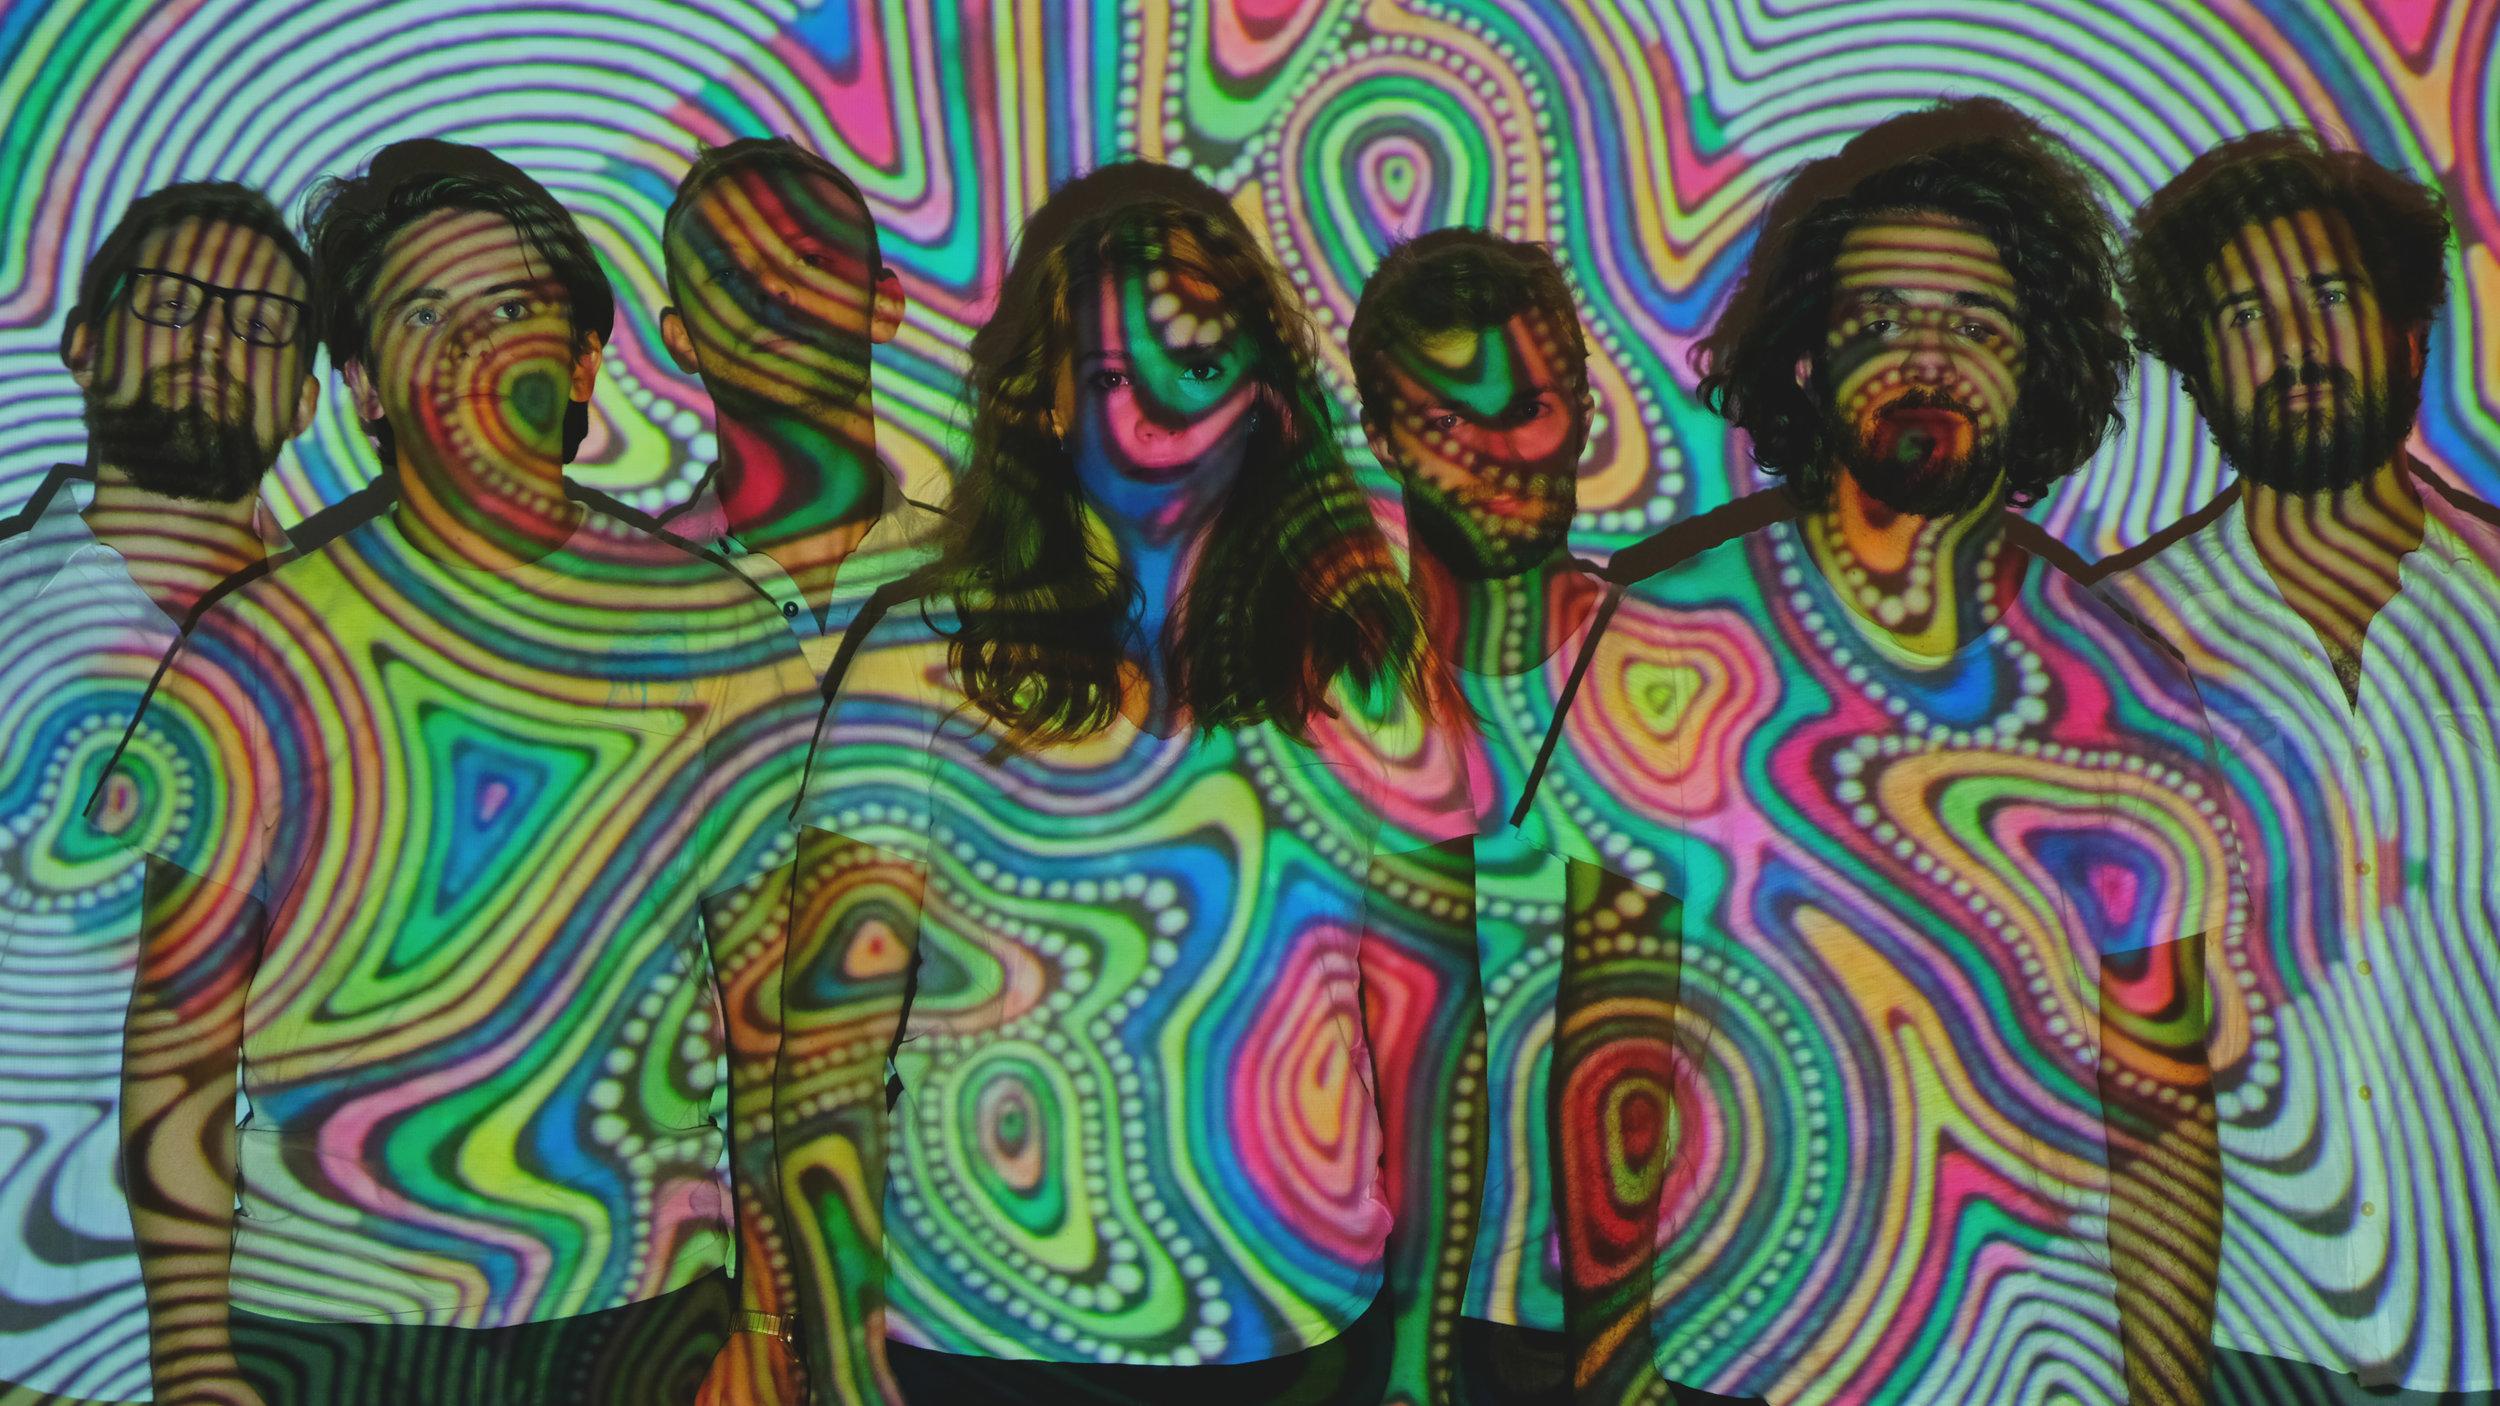 Mosaics_FullBand_colorsquiggles.jpg